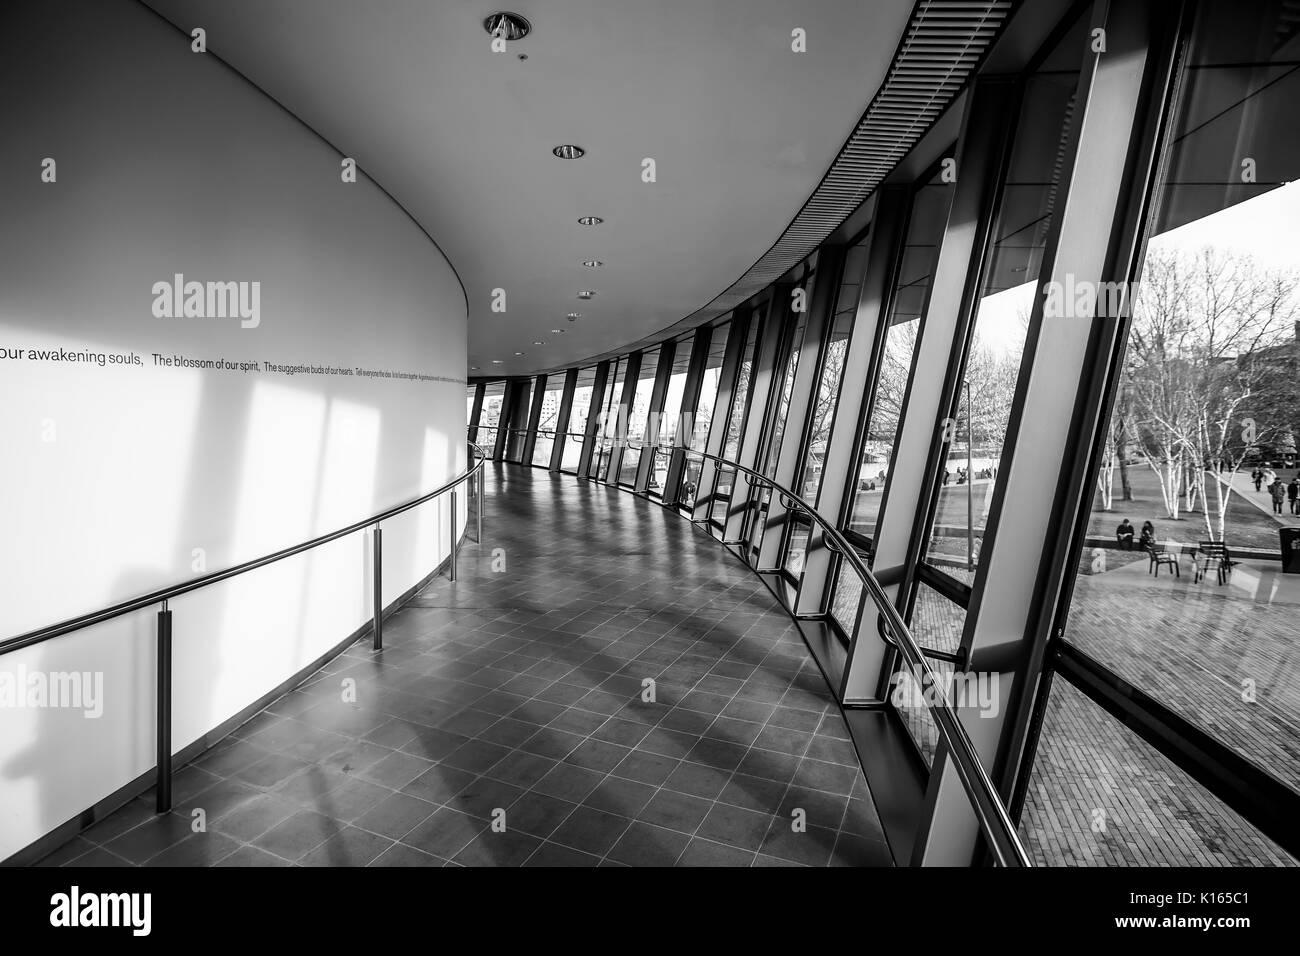 Inside London City Hall at River Thames - LONDON / ENGLAND - DECEMBER 6, 2017 - Stock Image